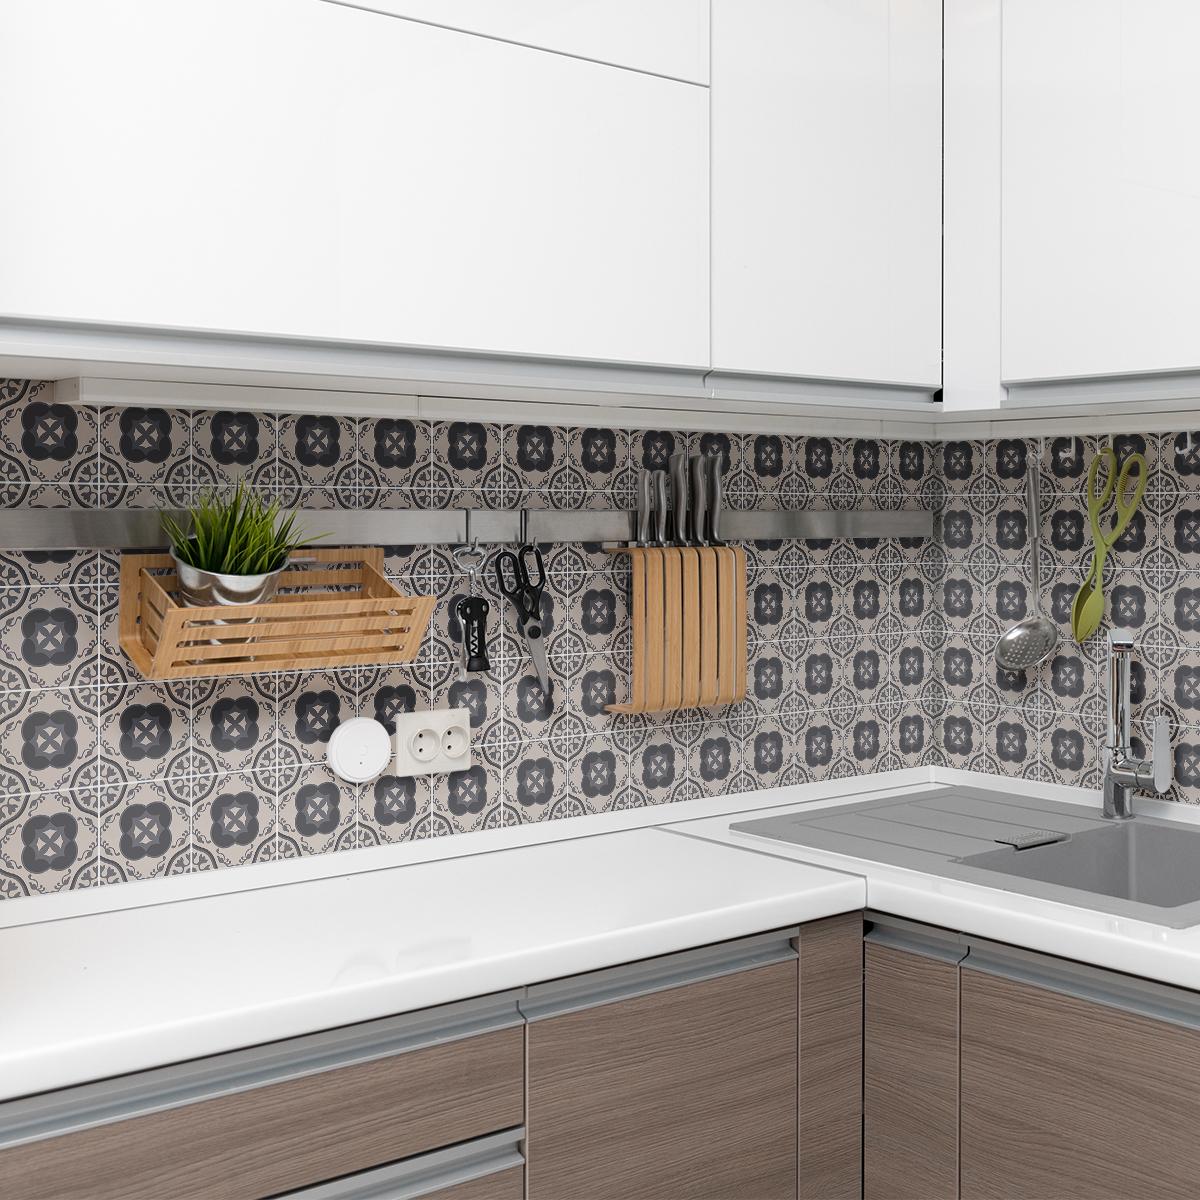 30 stickers carreaux de ciment azulejos porfirio cuisine carrelages ambiance sticker. Black Bedroom Furniture Sets. Home Design Ideas